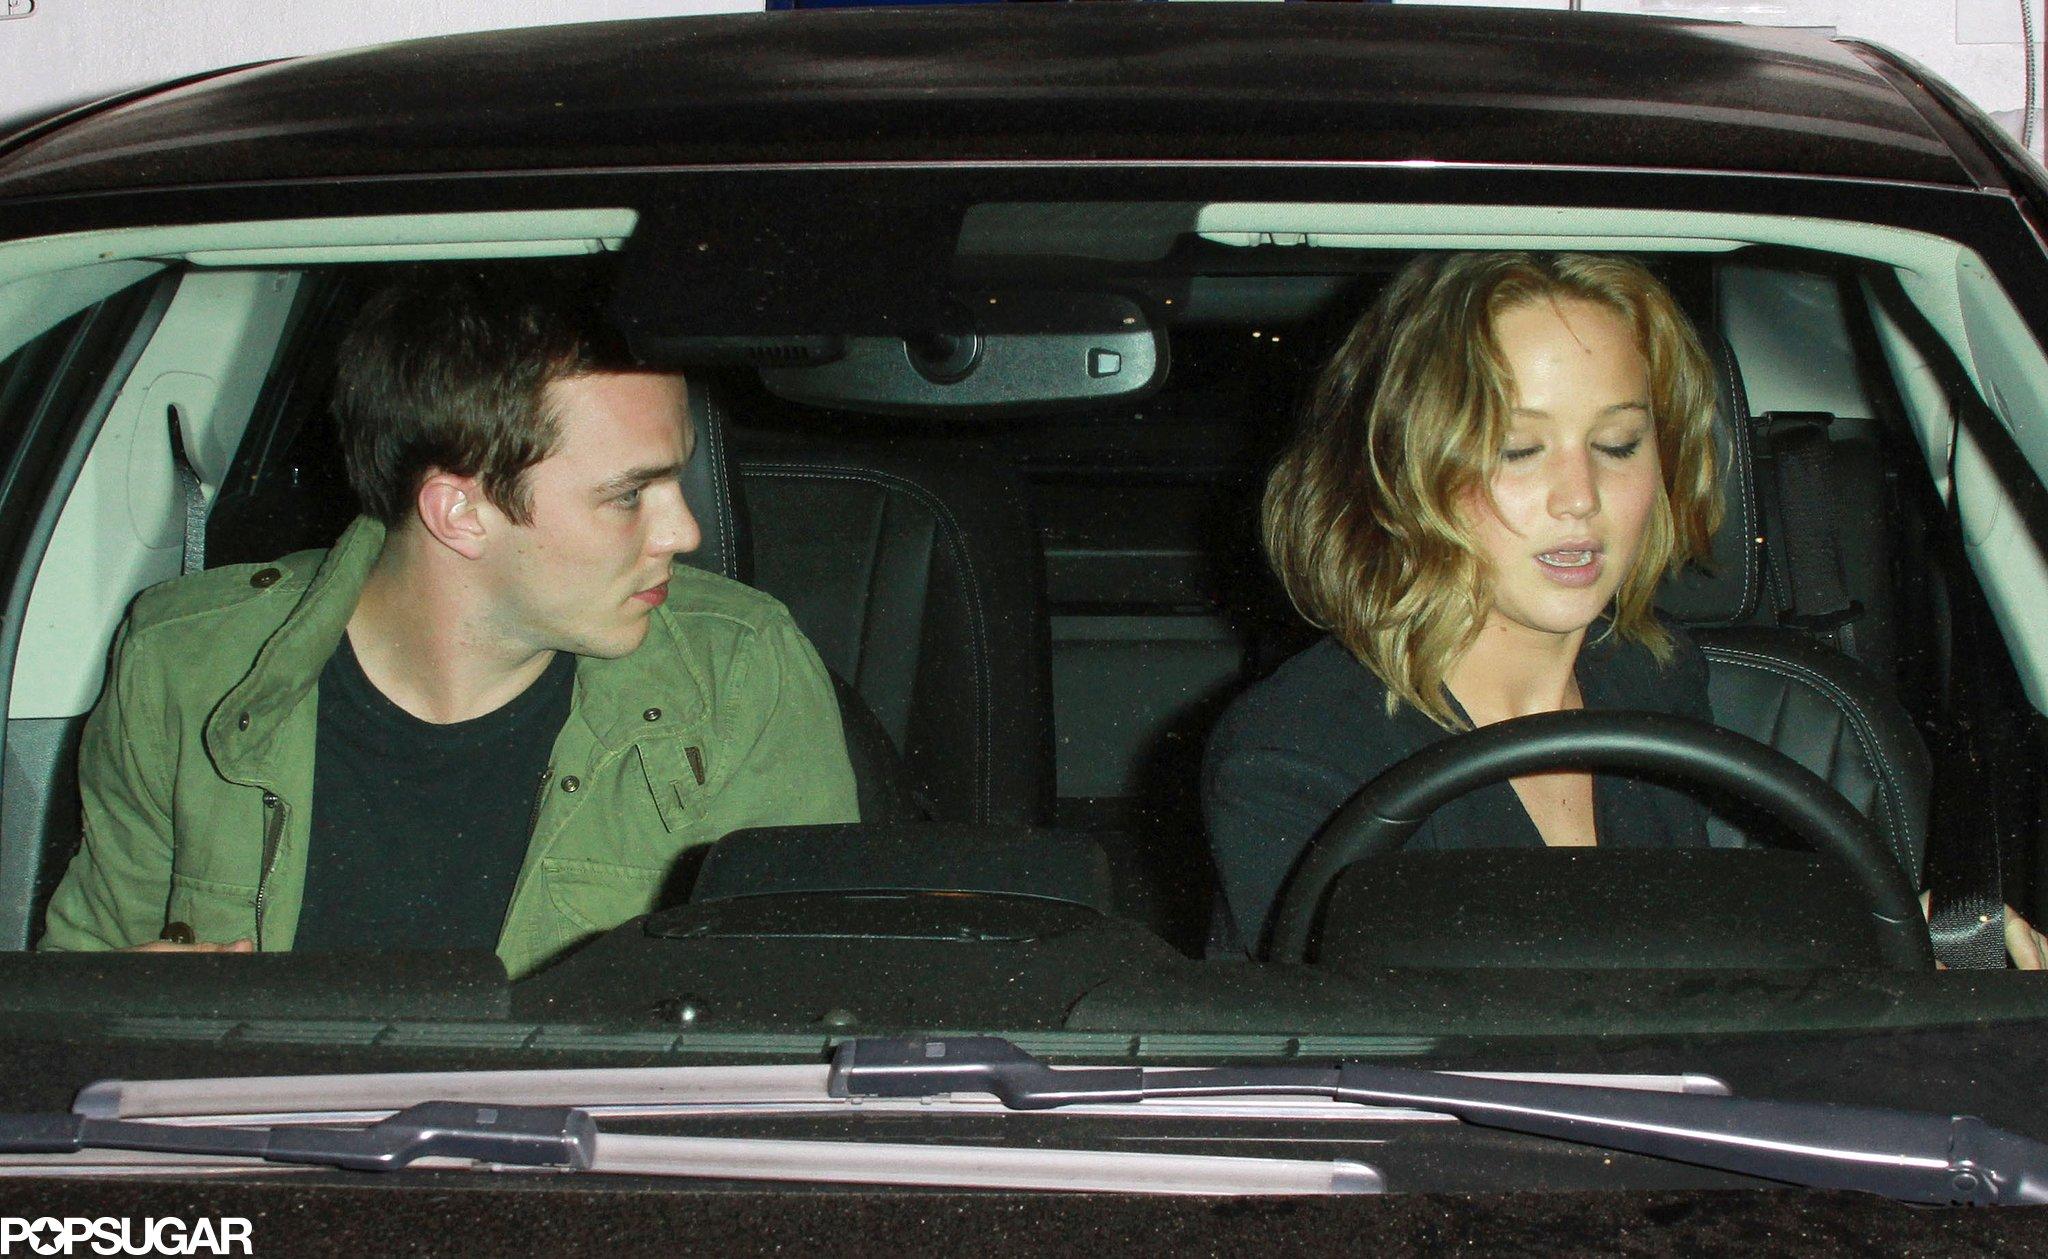 Jennifer Lawrence and Nicholas Hoult got into a car together.